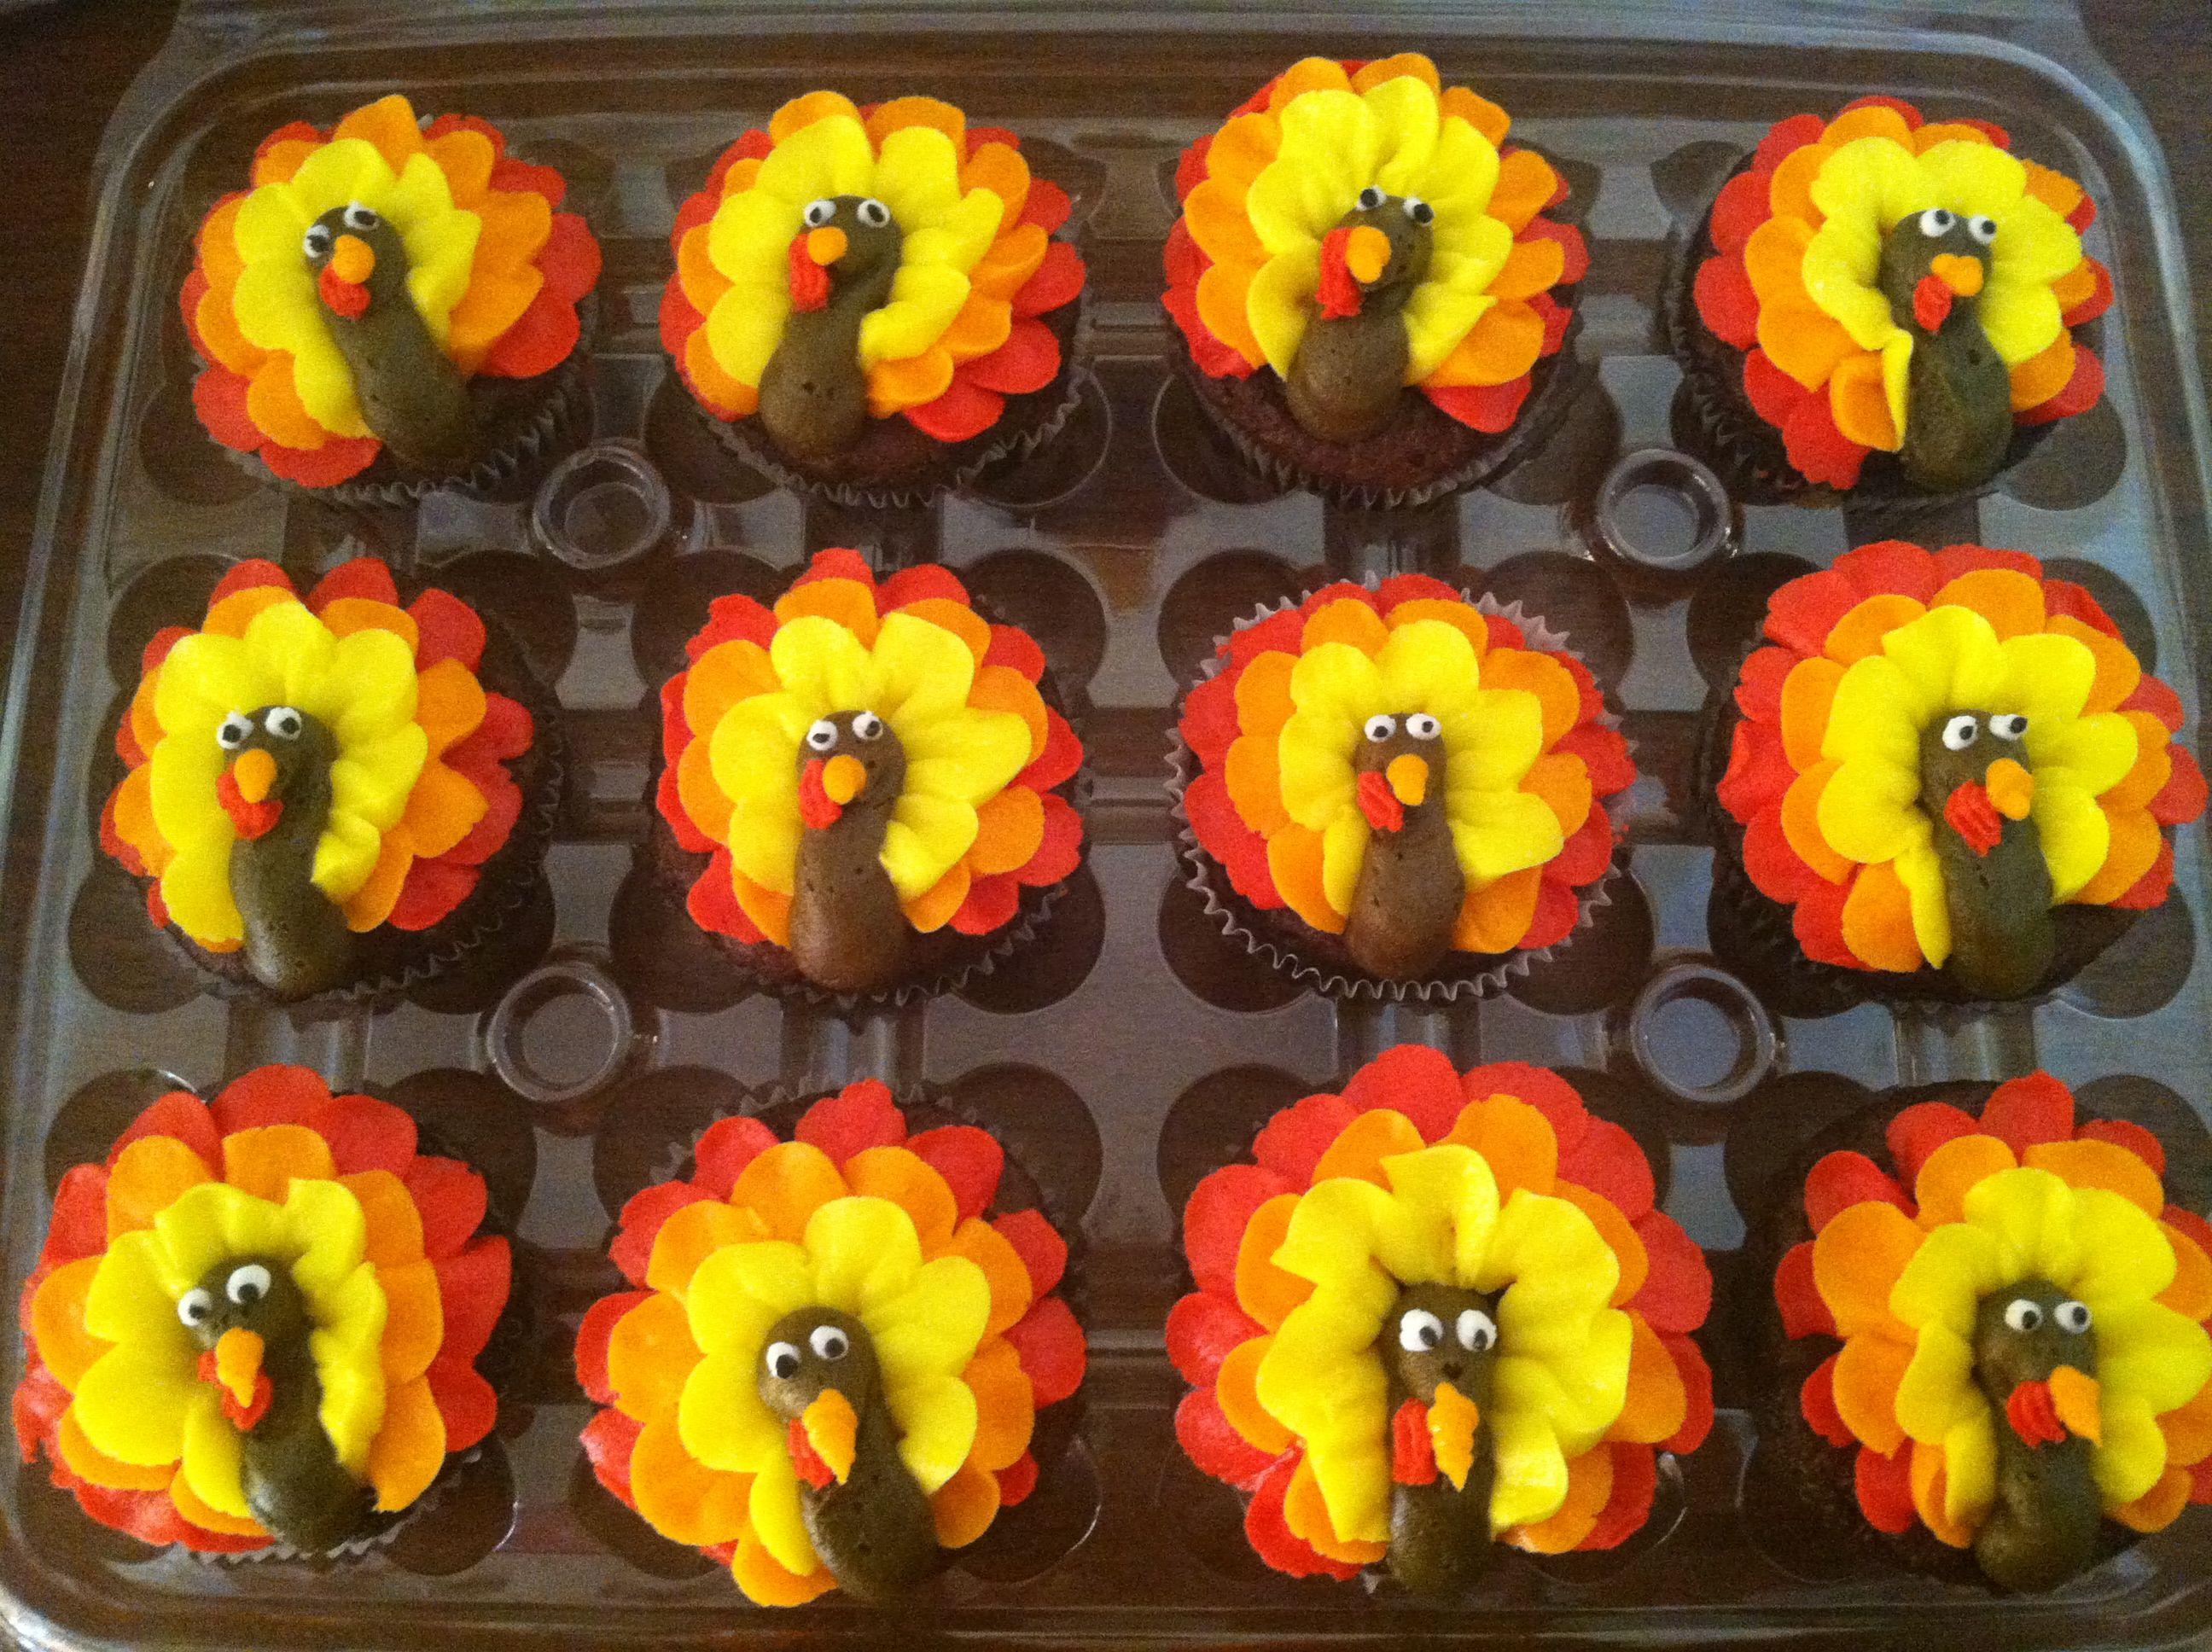 Cupcake Decorating Ideas Thanksgiving : Turkey Cupcakes Cake & Cupcake Ideas (decorating ...